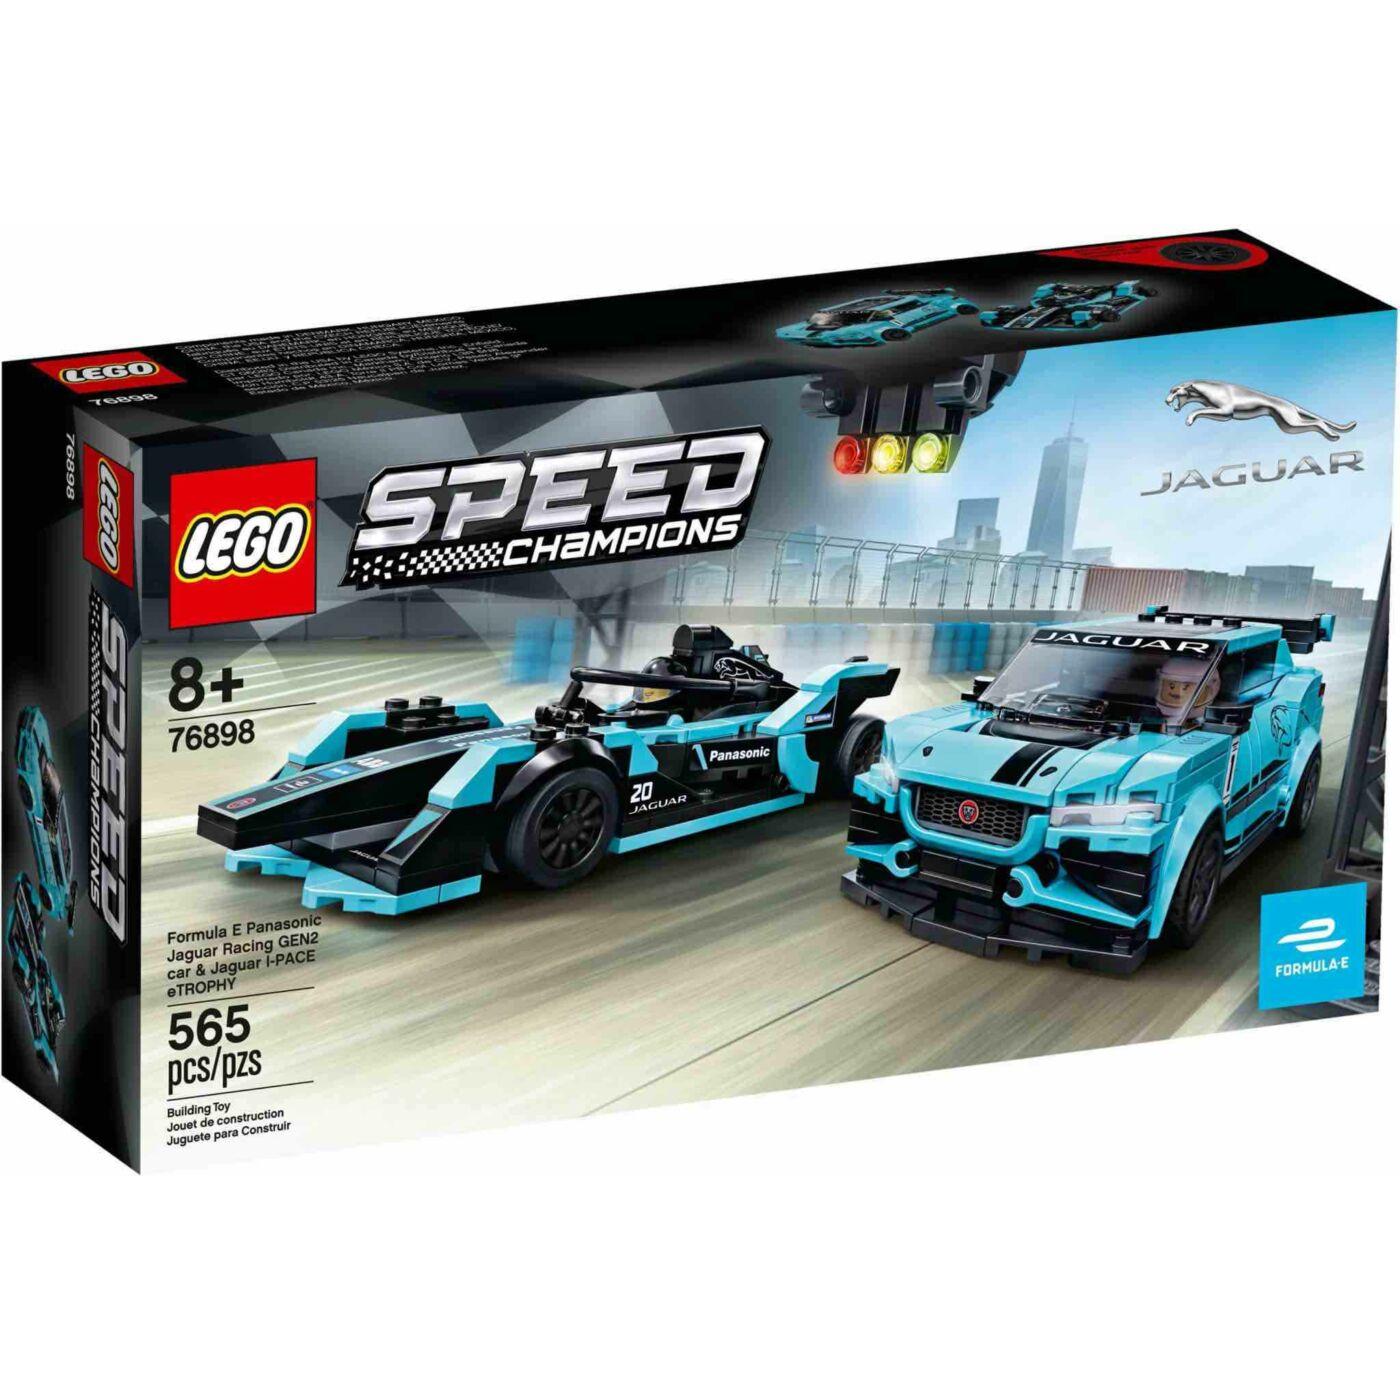 Lego Speed Champions Formula E Jaguar racing